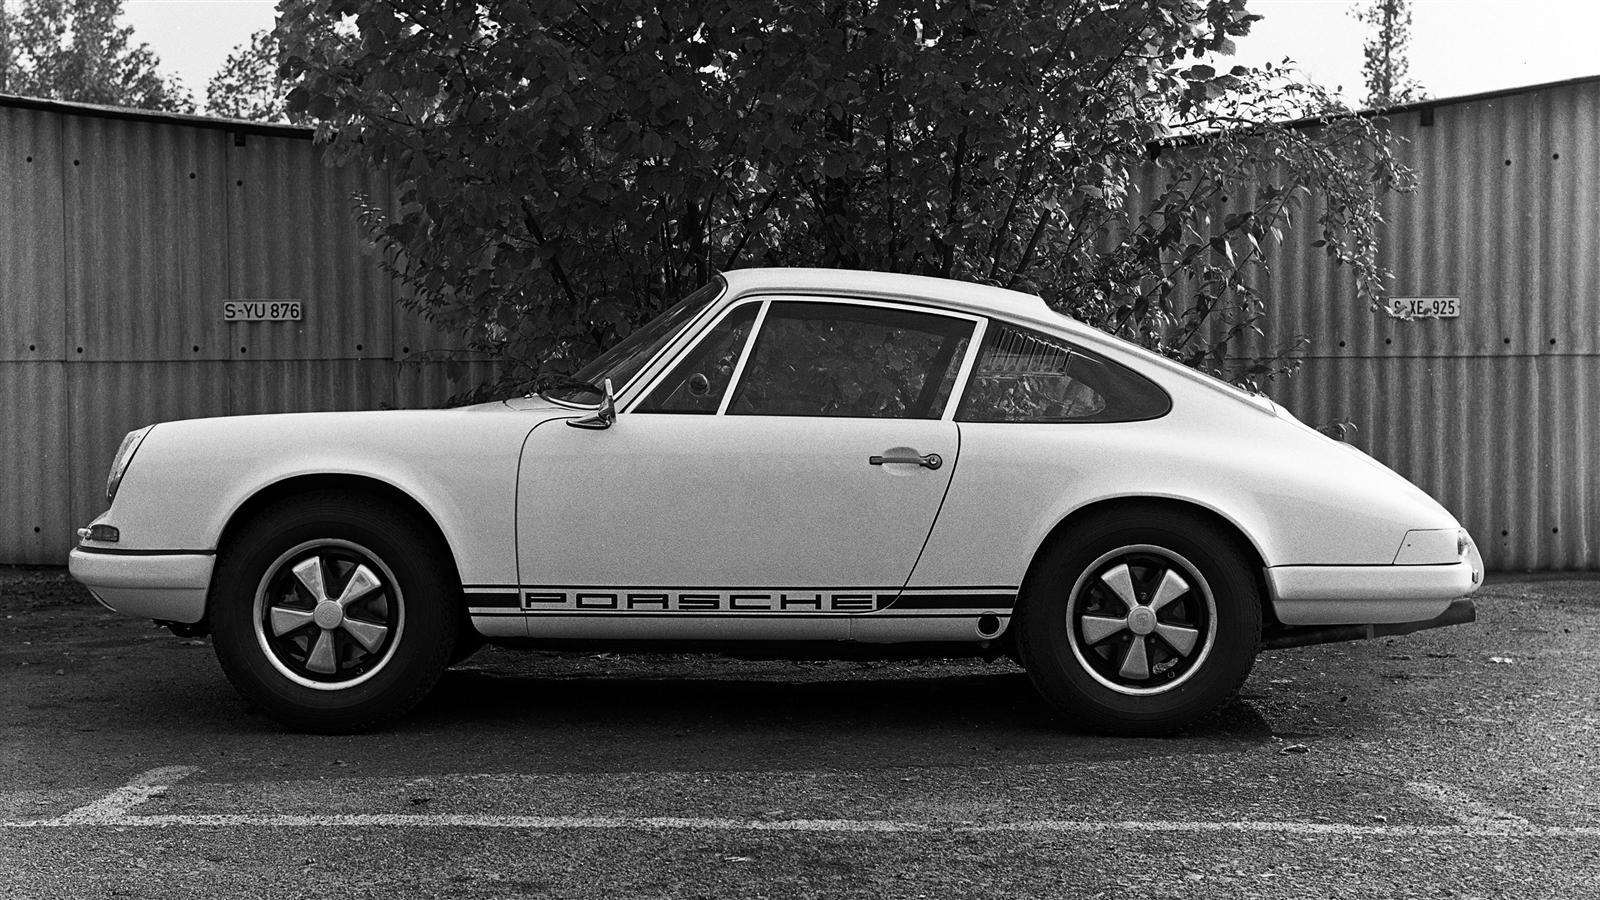 Gallery Motorsport Accessories Porsche Tequipment